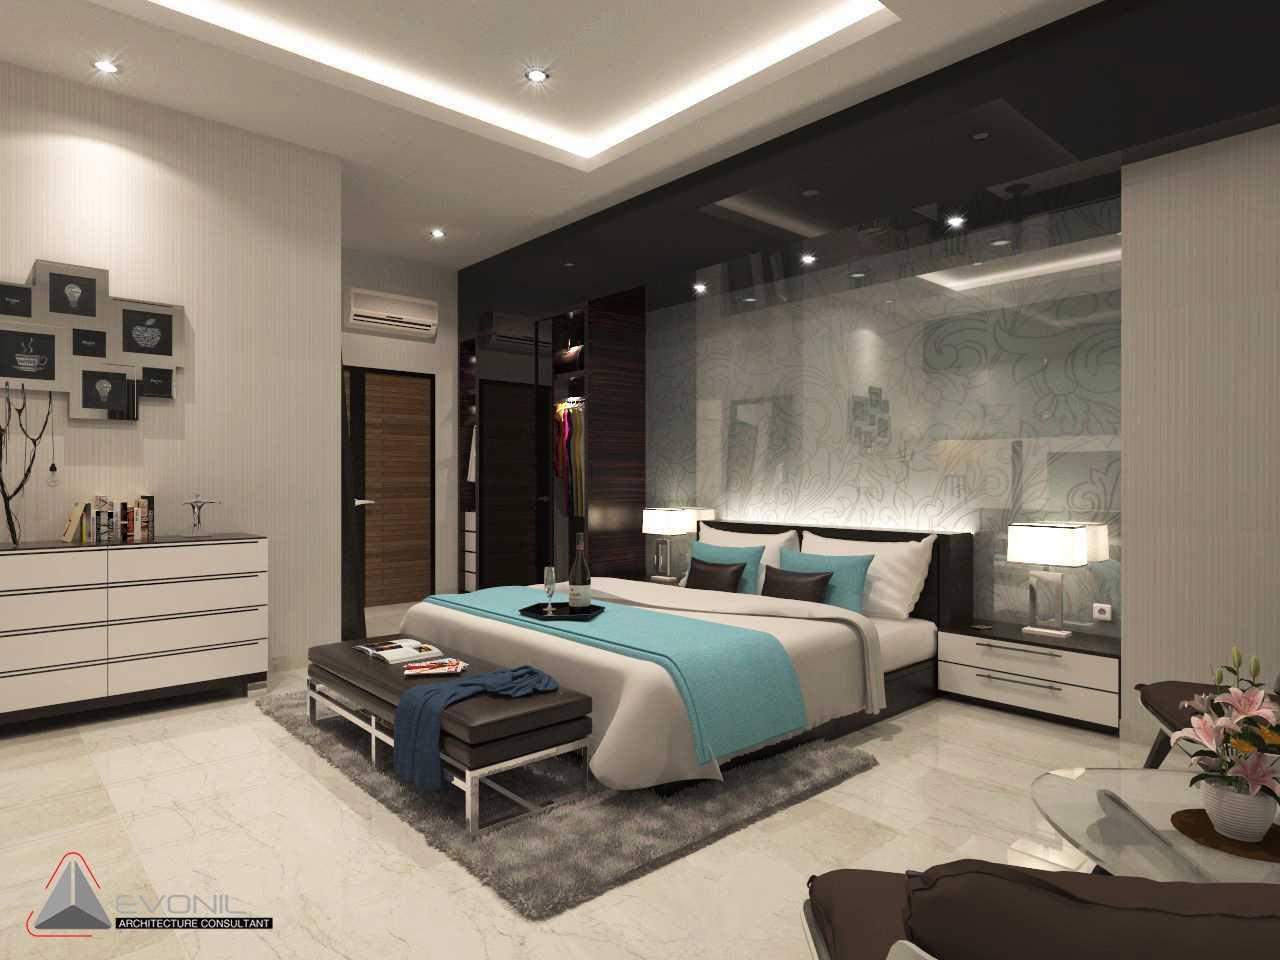 Evonil Architecture Residence Pluit Timur Pluit, Jakarta Pluit, Jakarta Bedroom-2Nd-Floor-Residence-Pluit-Timur Asian 13024